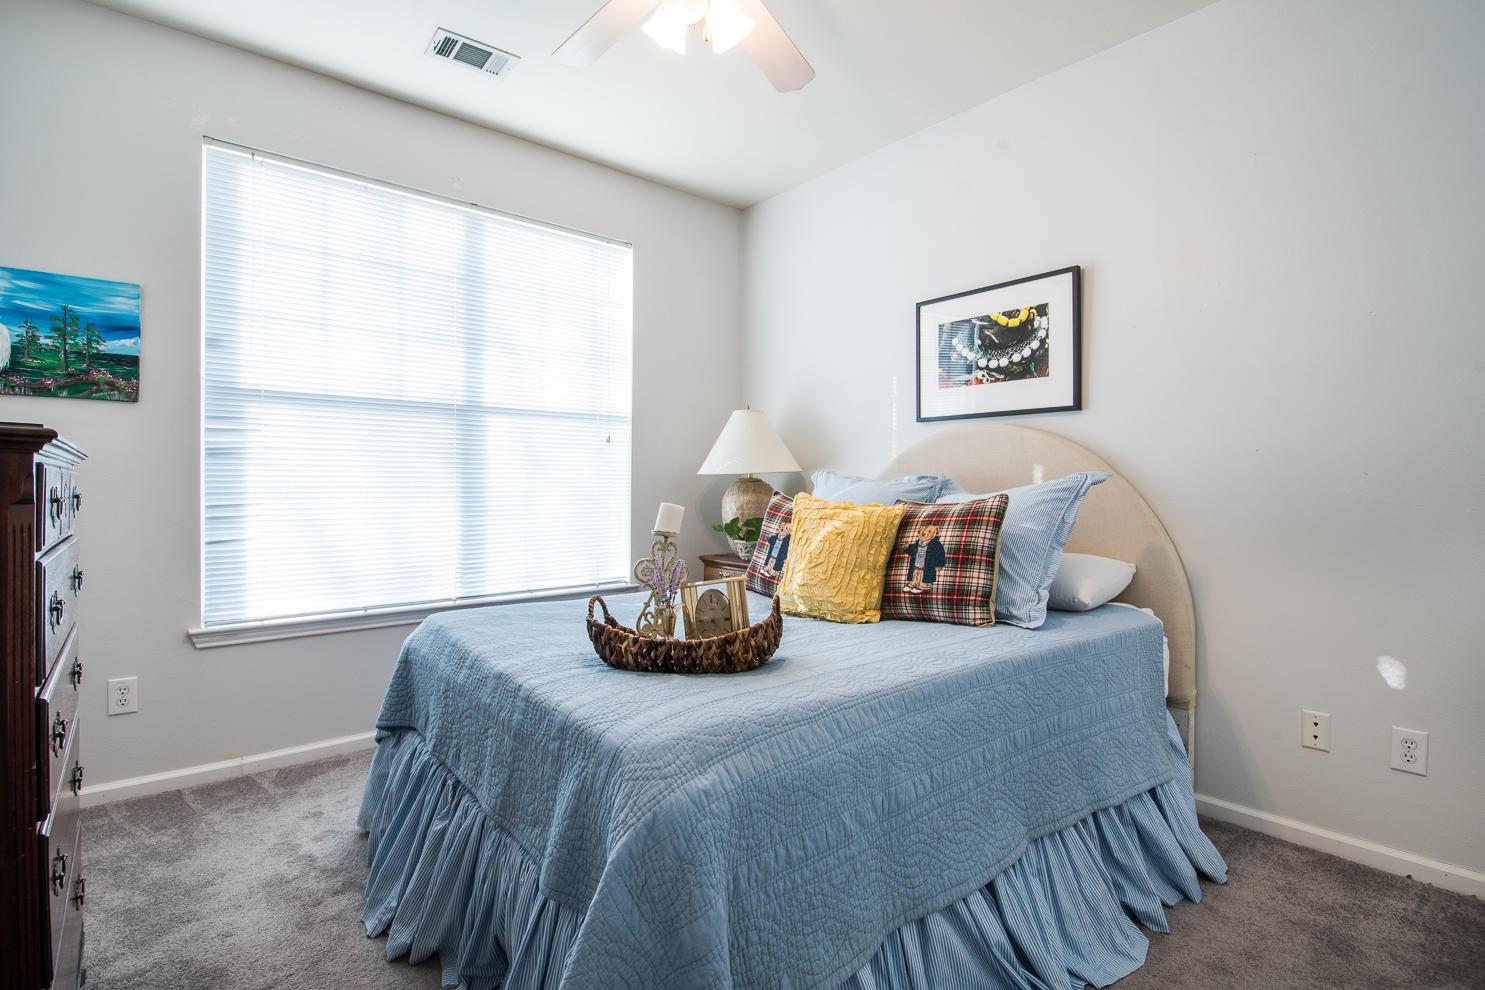 Daniel Landing Condos Homes For Sale - 130 River Landing, Charleston, SC - 18